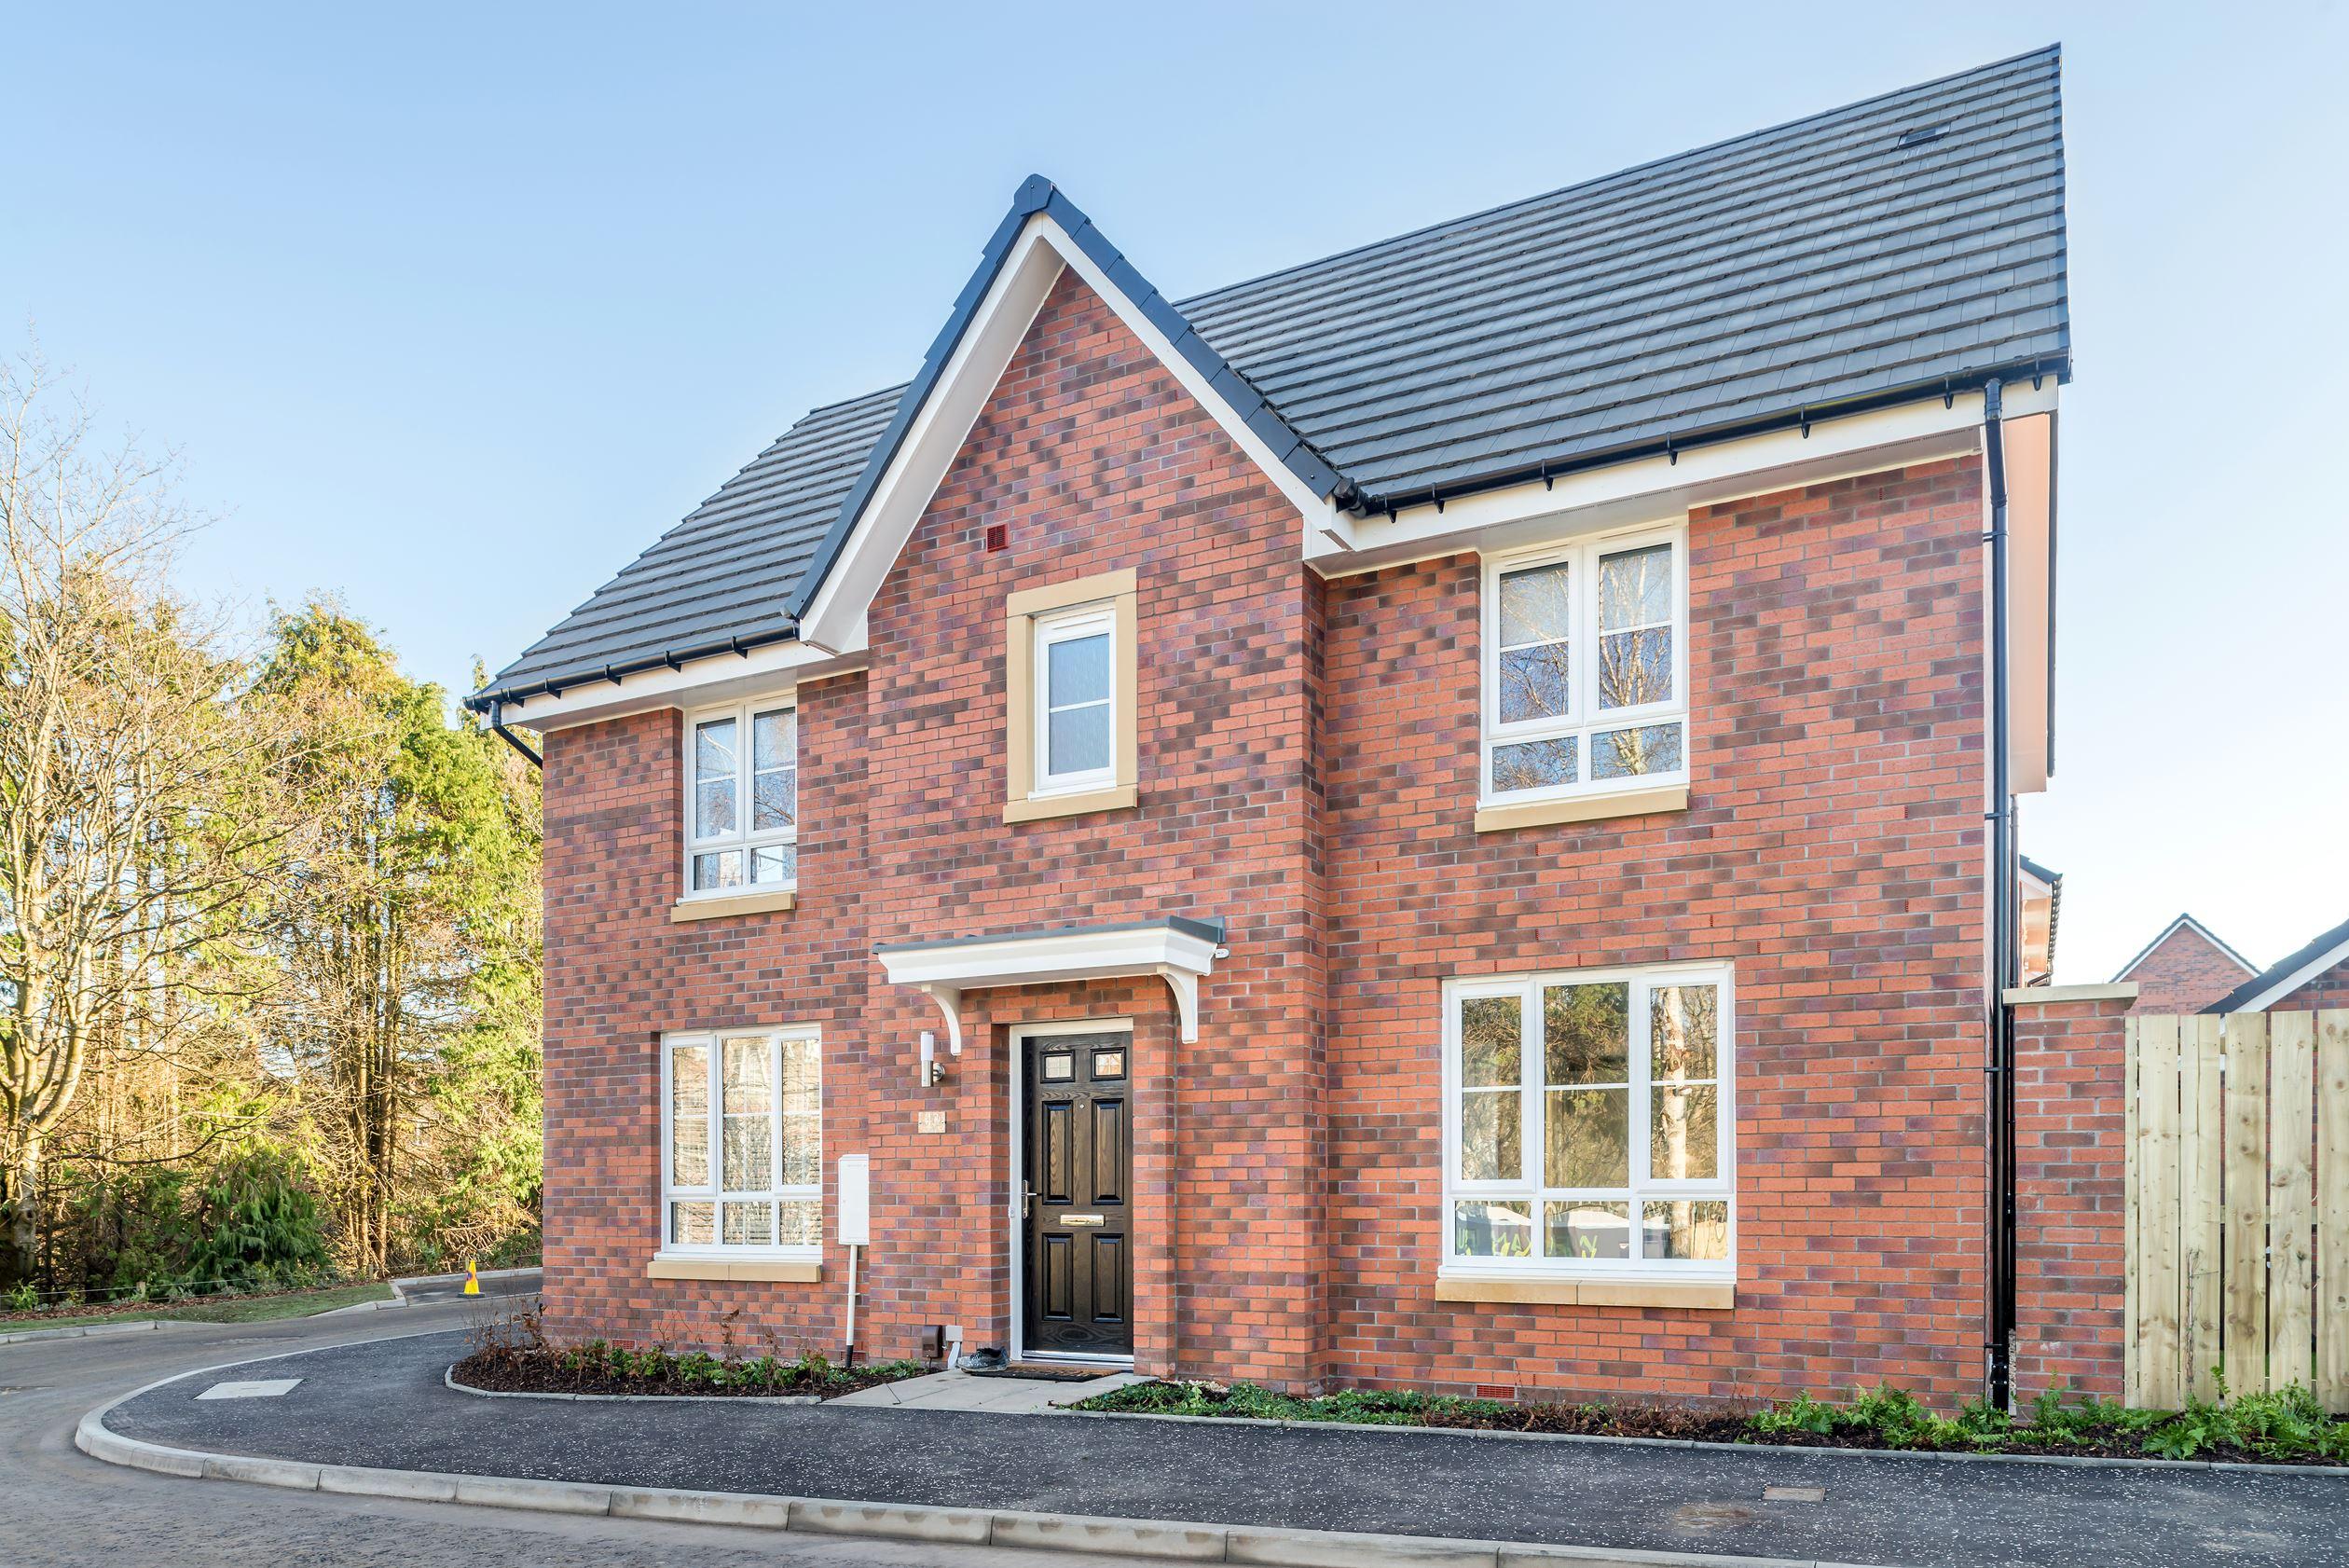 New Houses For Sale In Glasgow Barratt Homes